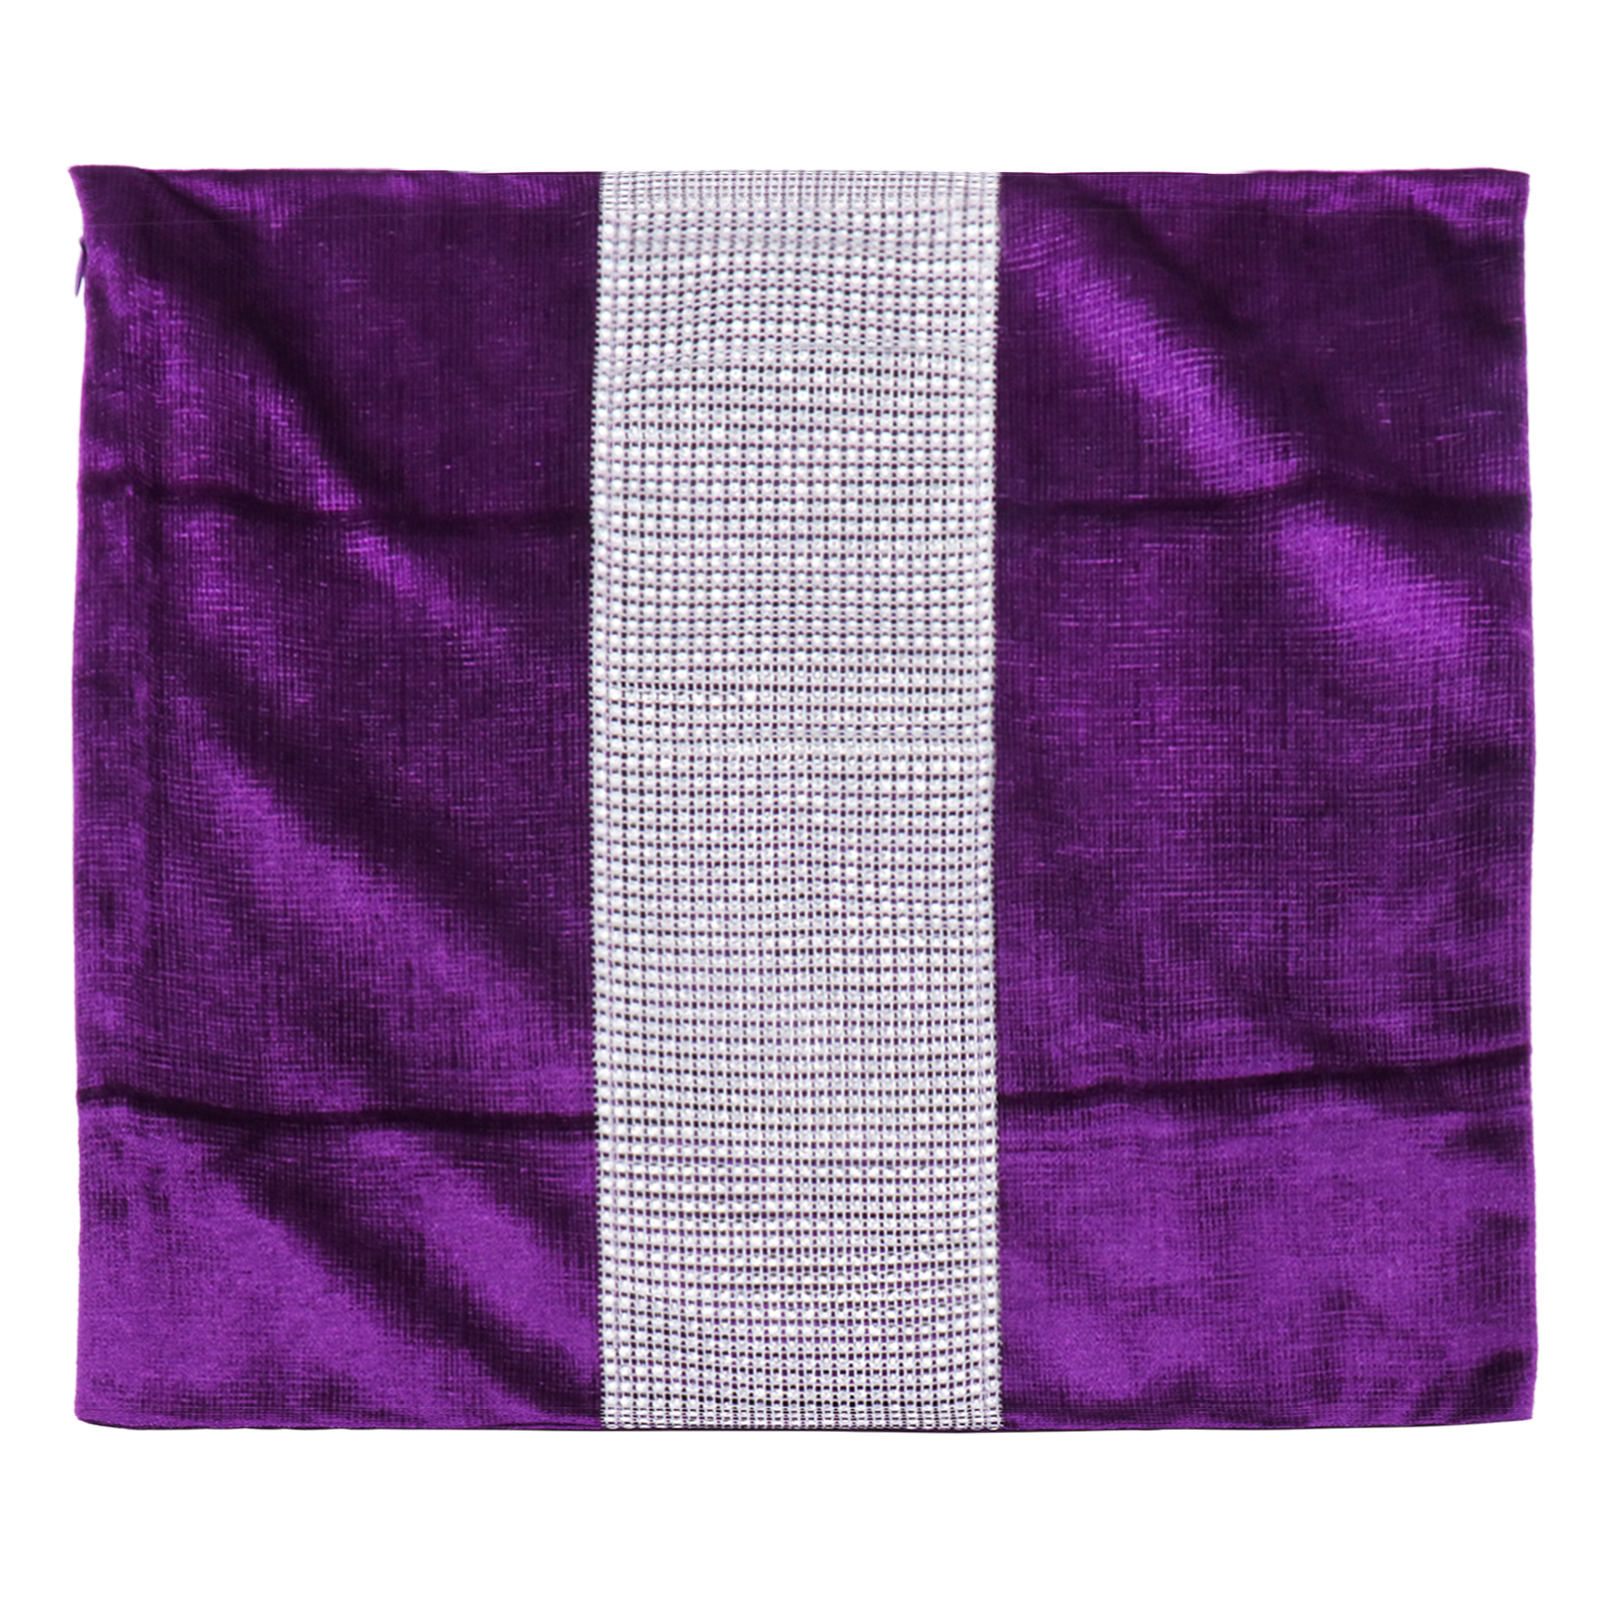 Decorative Pillow Case Flannel Diamond Patckwork Modern Simple Throw Cover Pillowcase Party Hotel Home Textile 45cm*45cm